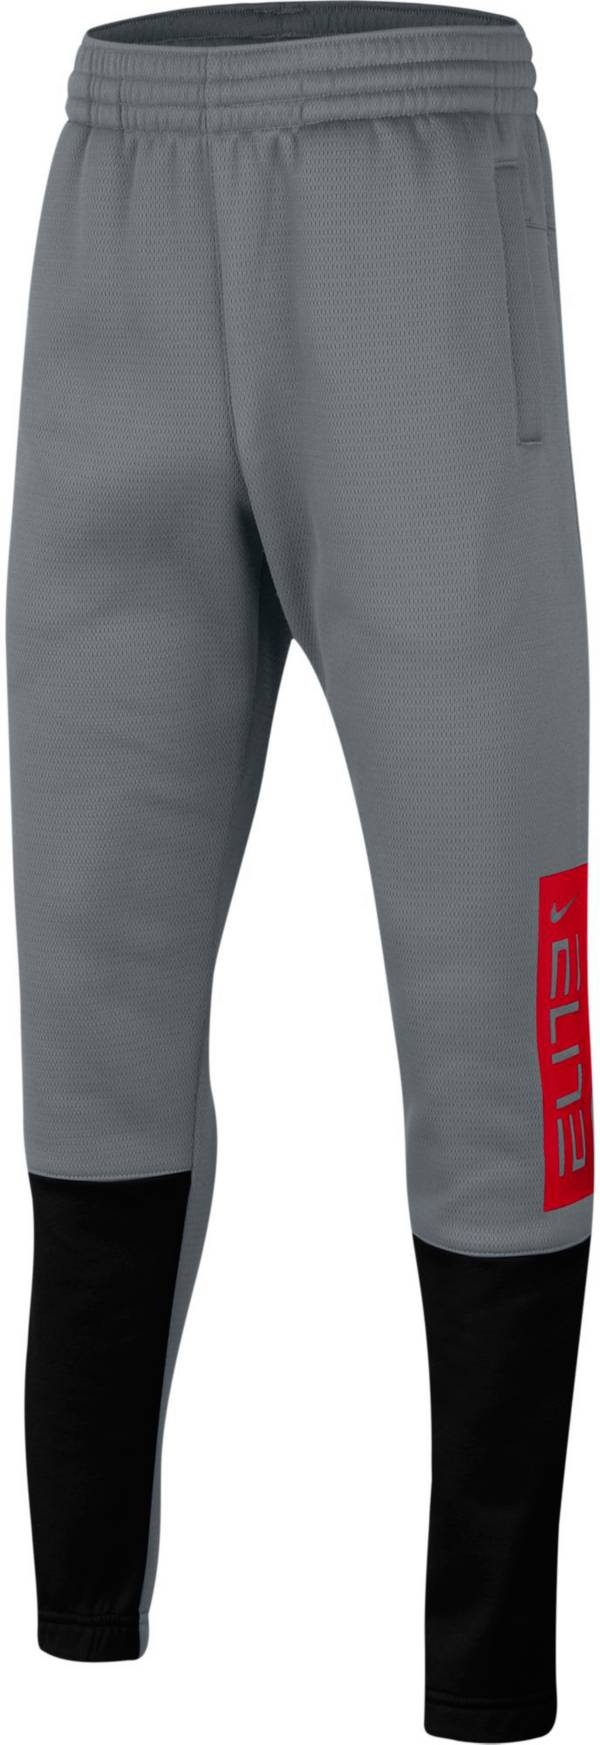 Nike Boys' Therma Elite Basketball Pants product image